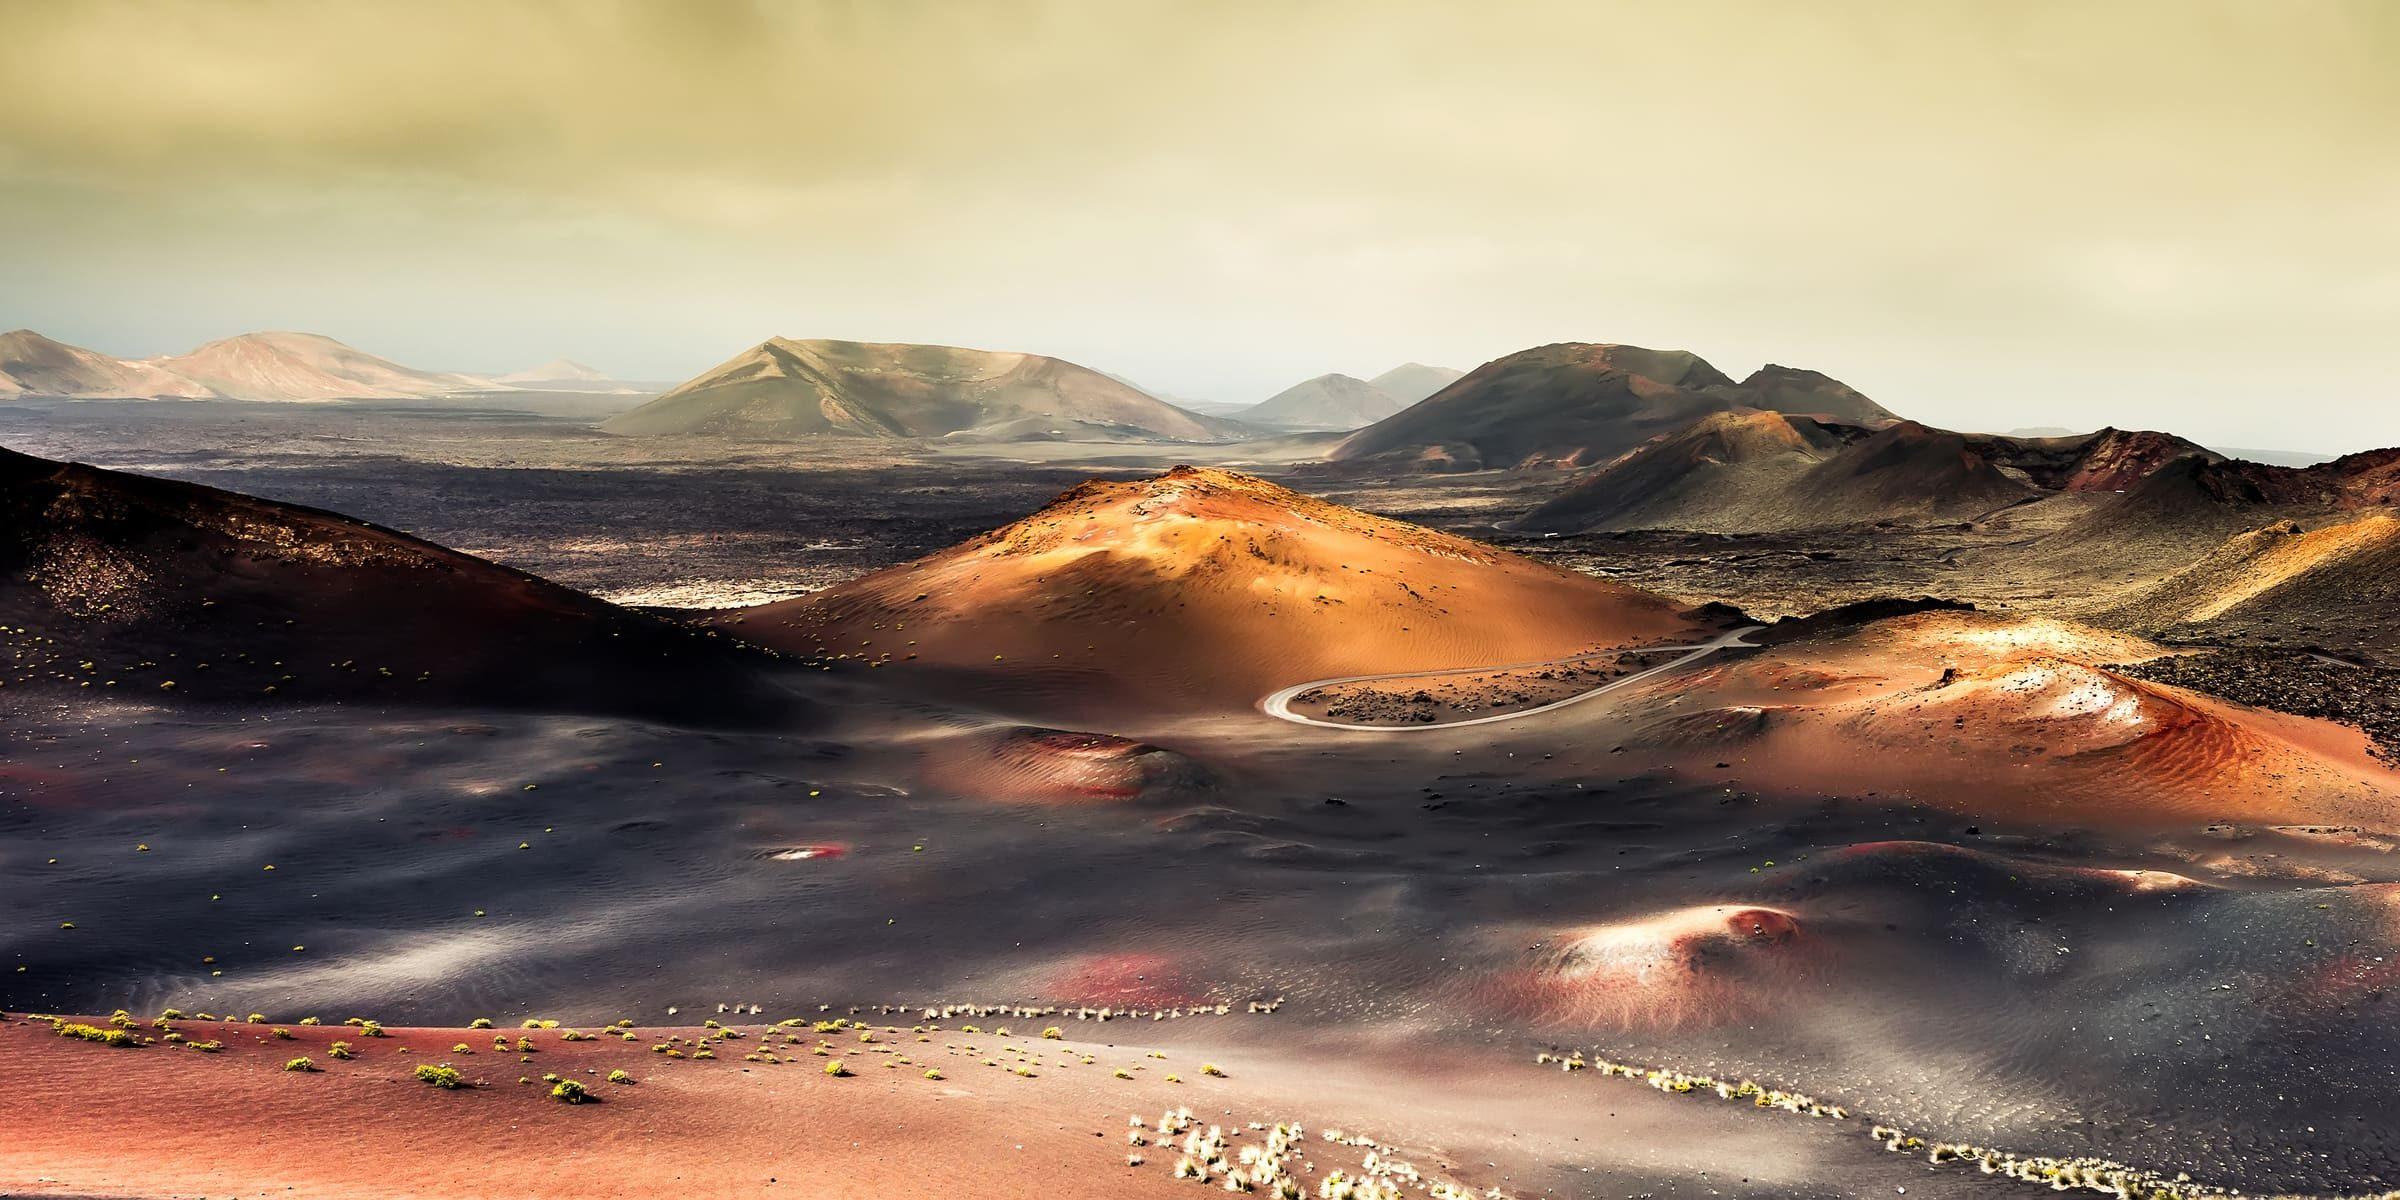 Singleurlaub auf Lanzarote - Berglandschaft